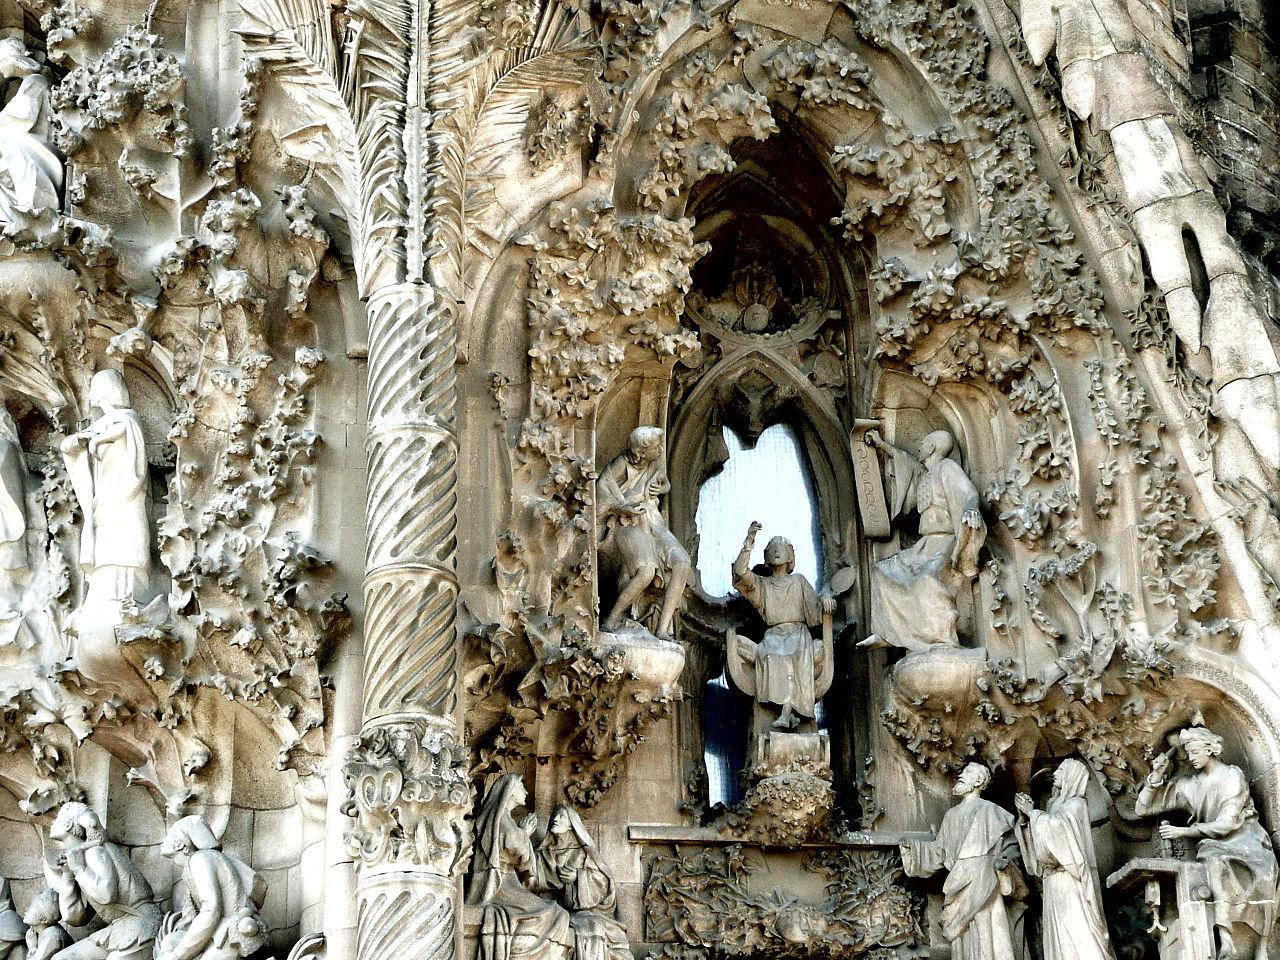 The Nativity façade of the Basilica and Expiatory Church of the Holy Family